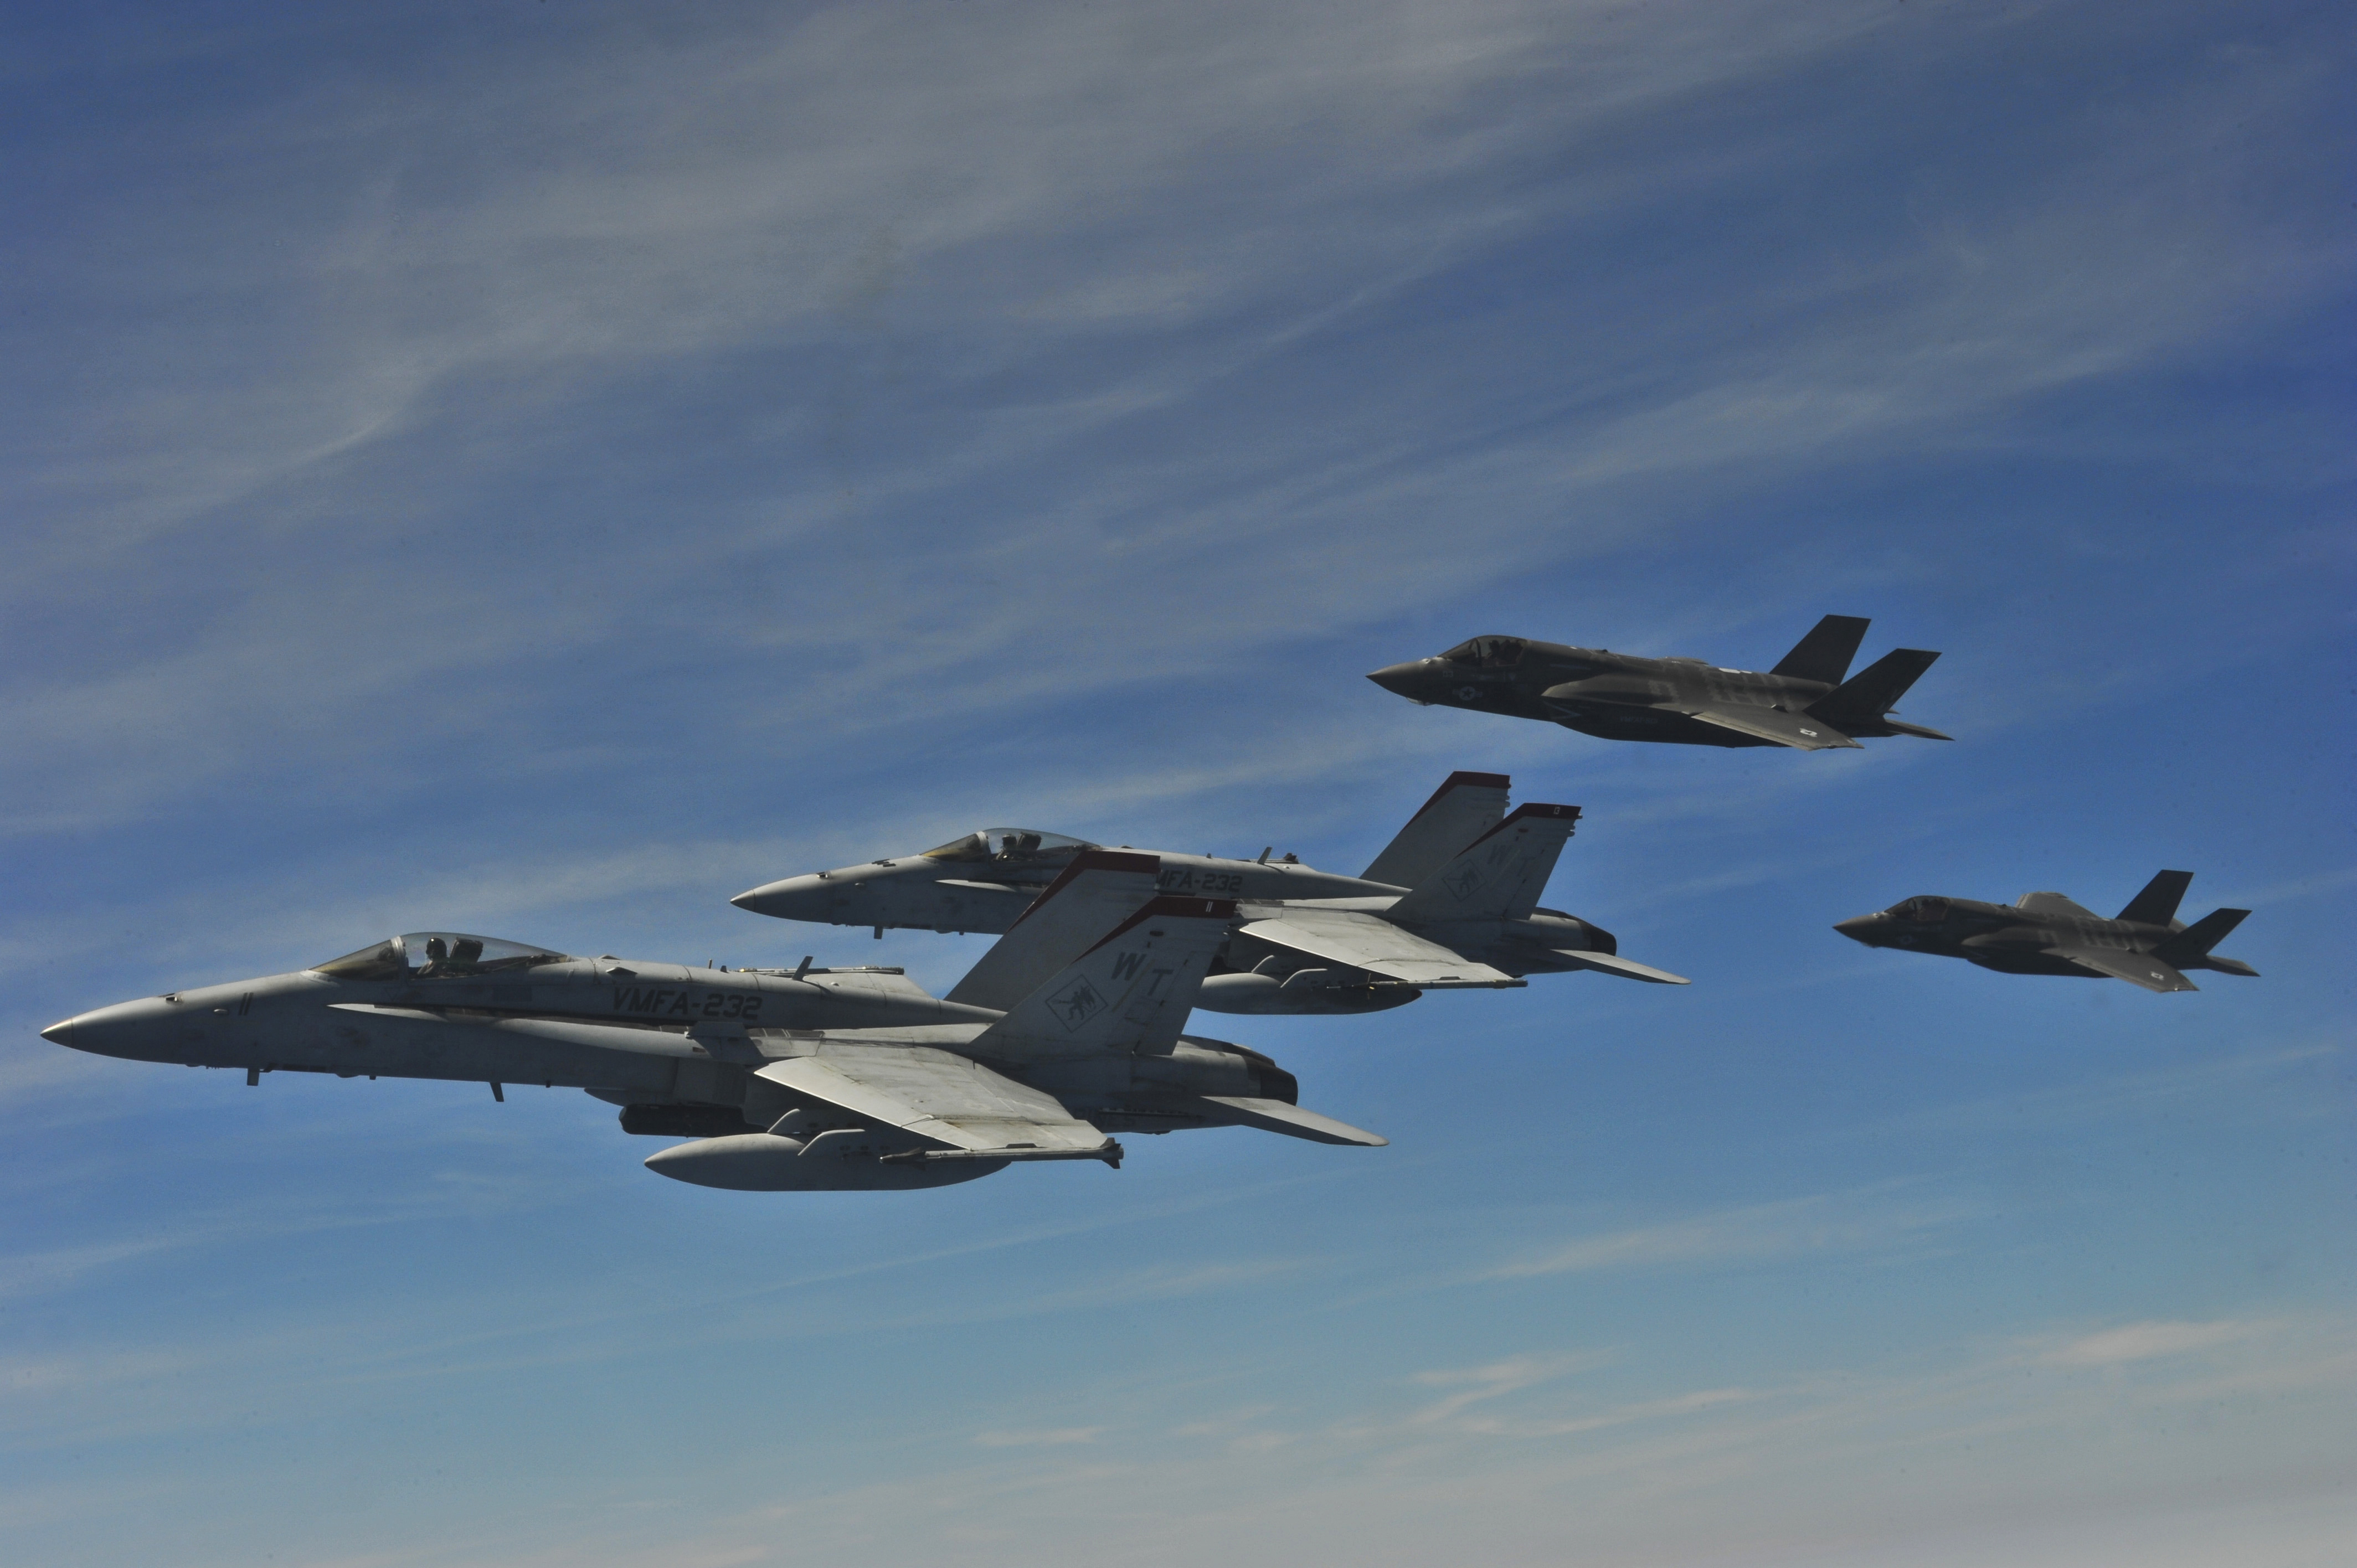 File:U.S. Marine Corps F-35 Lightning II aircraft and F-18 ...